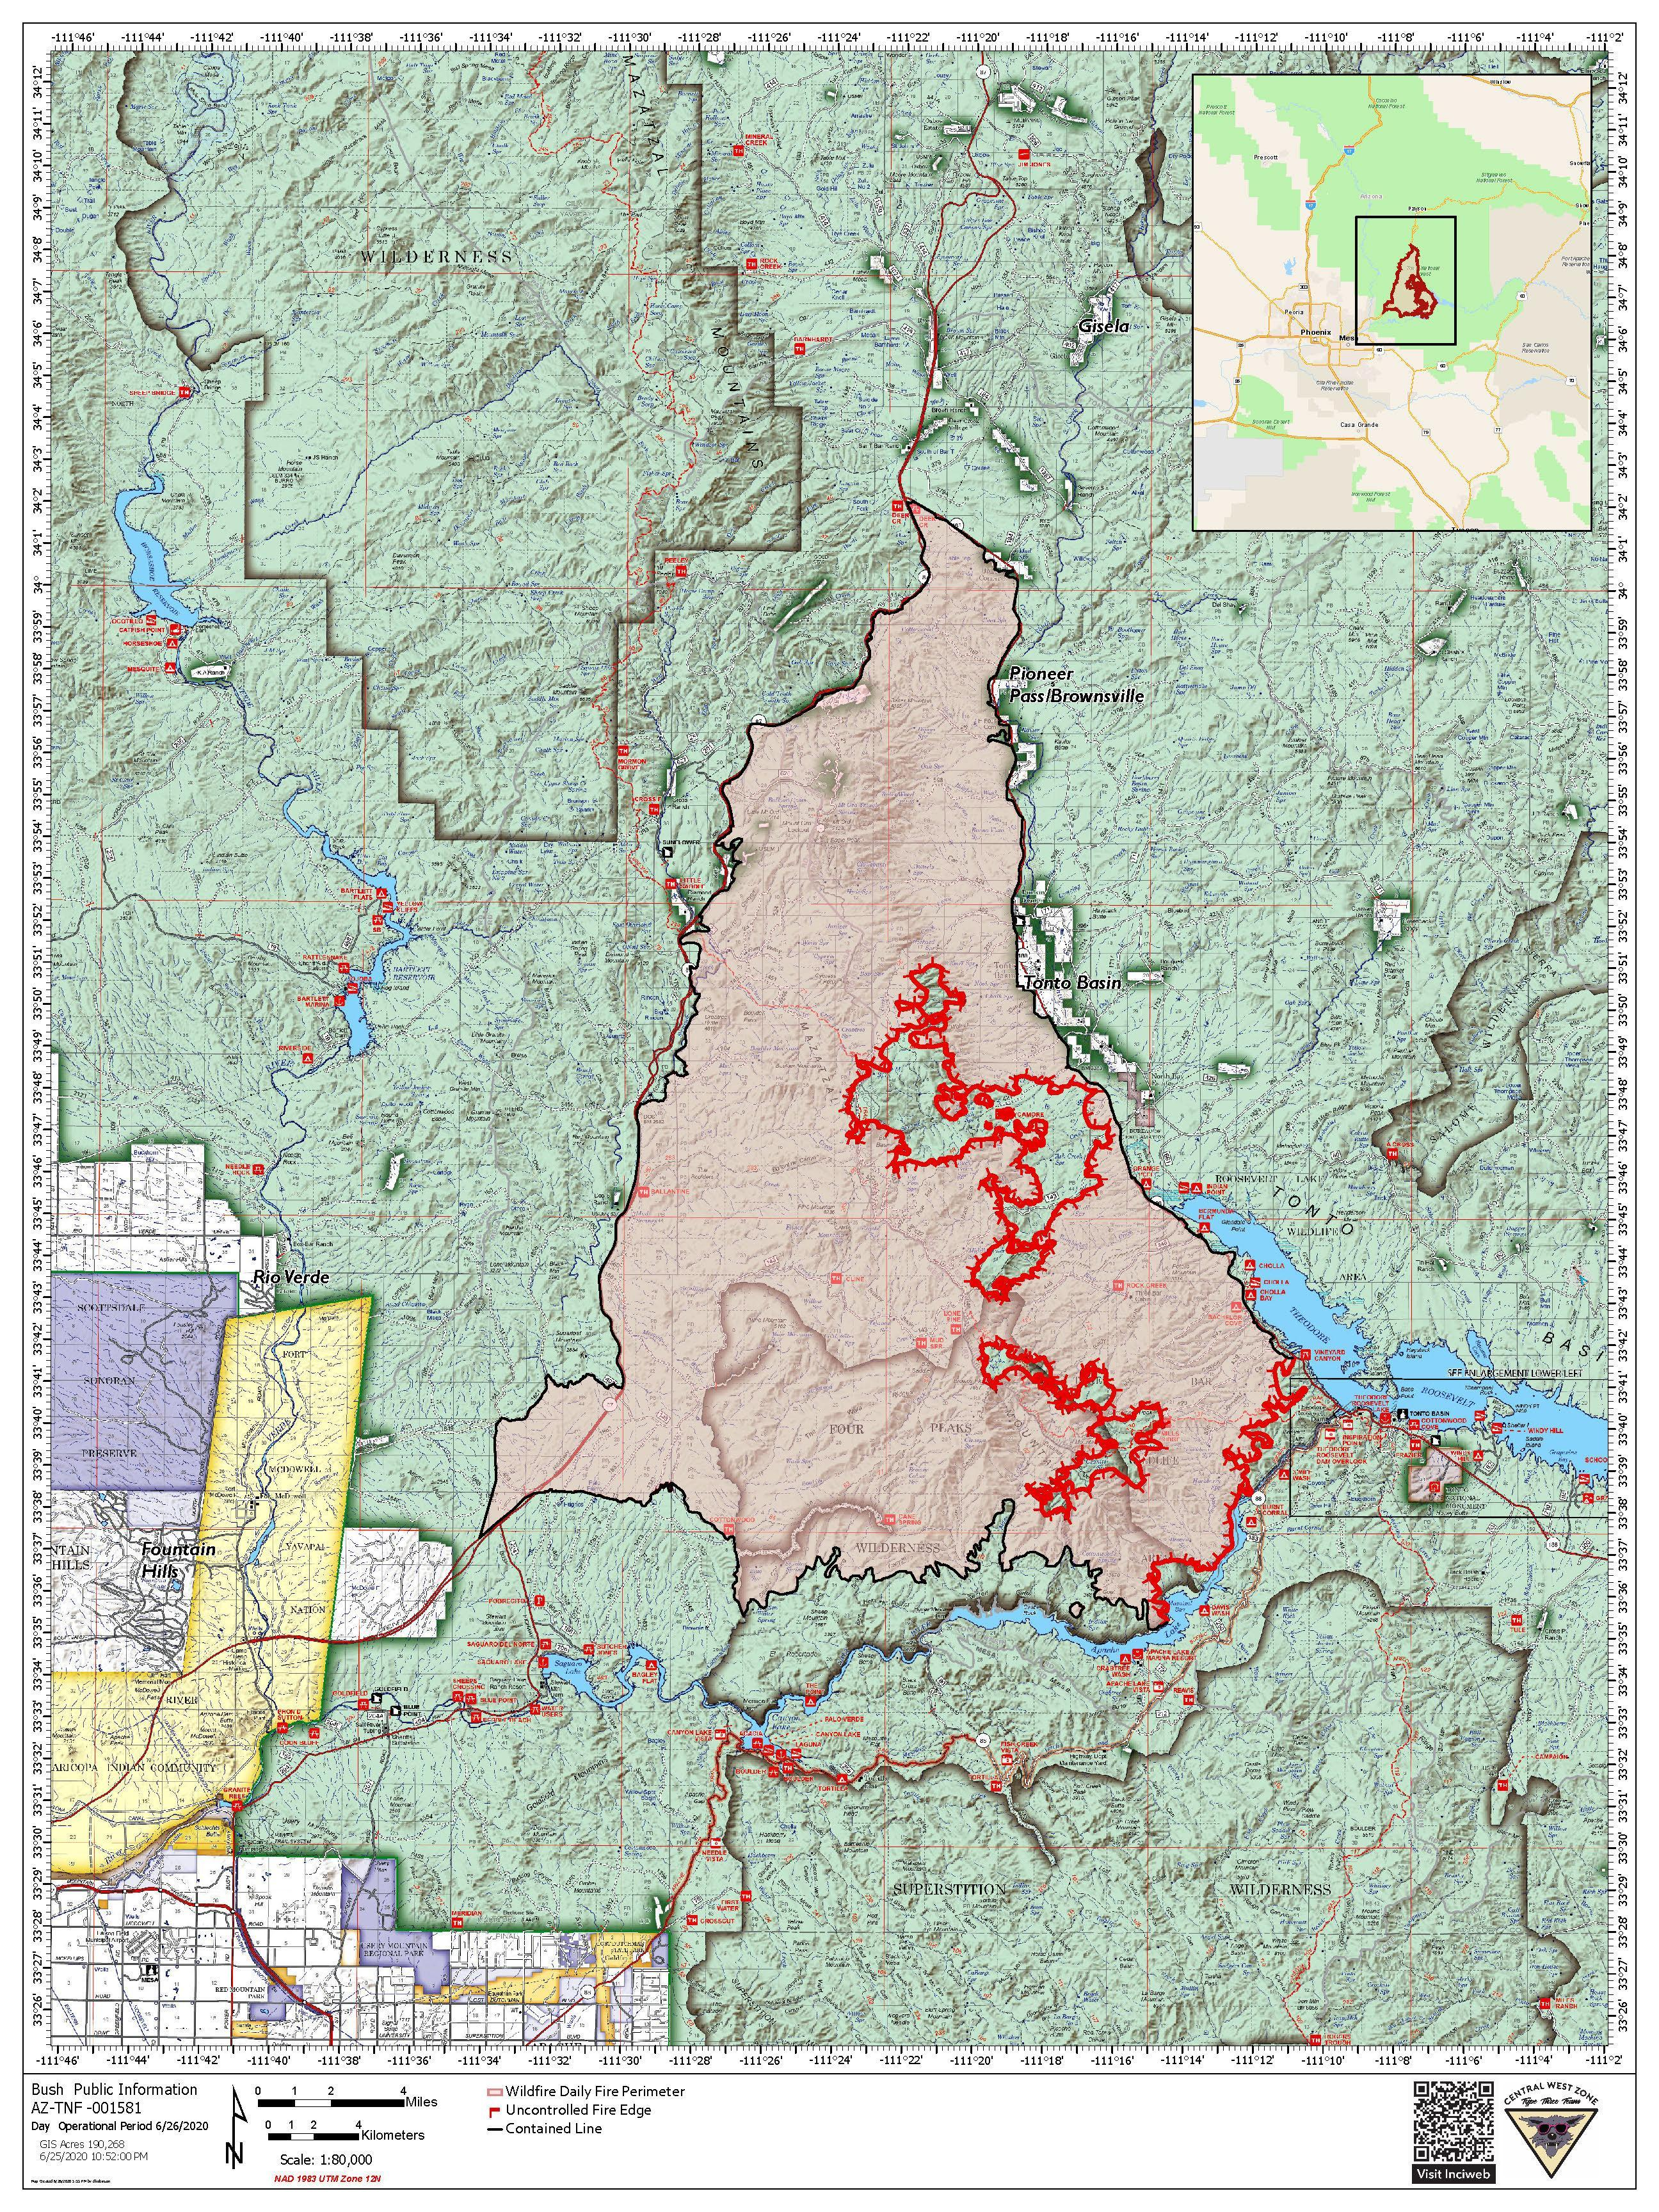 Bush Fire Map 6-27-20